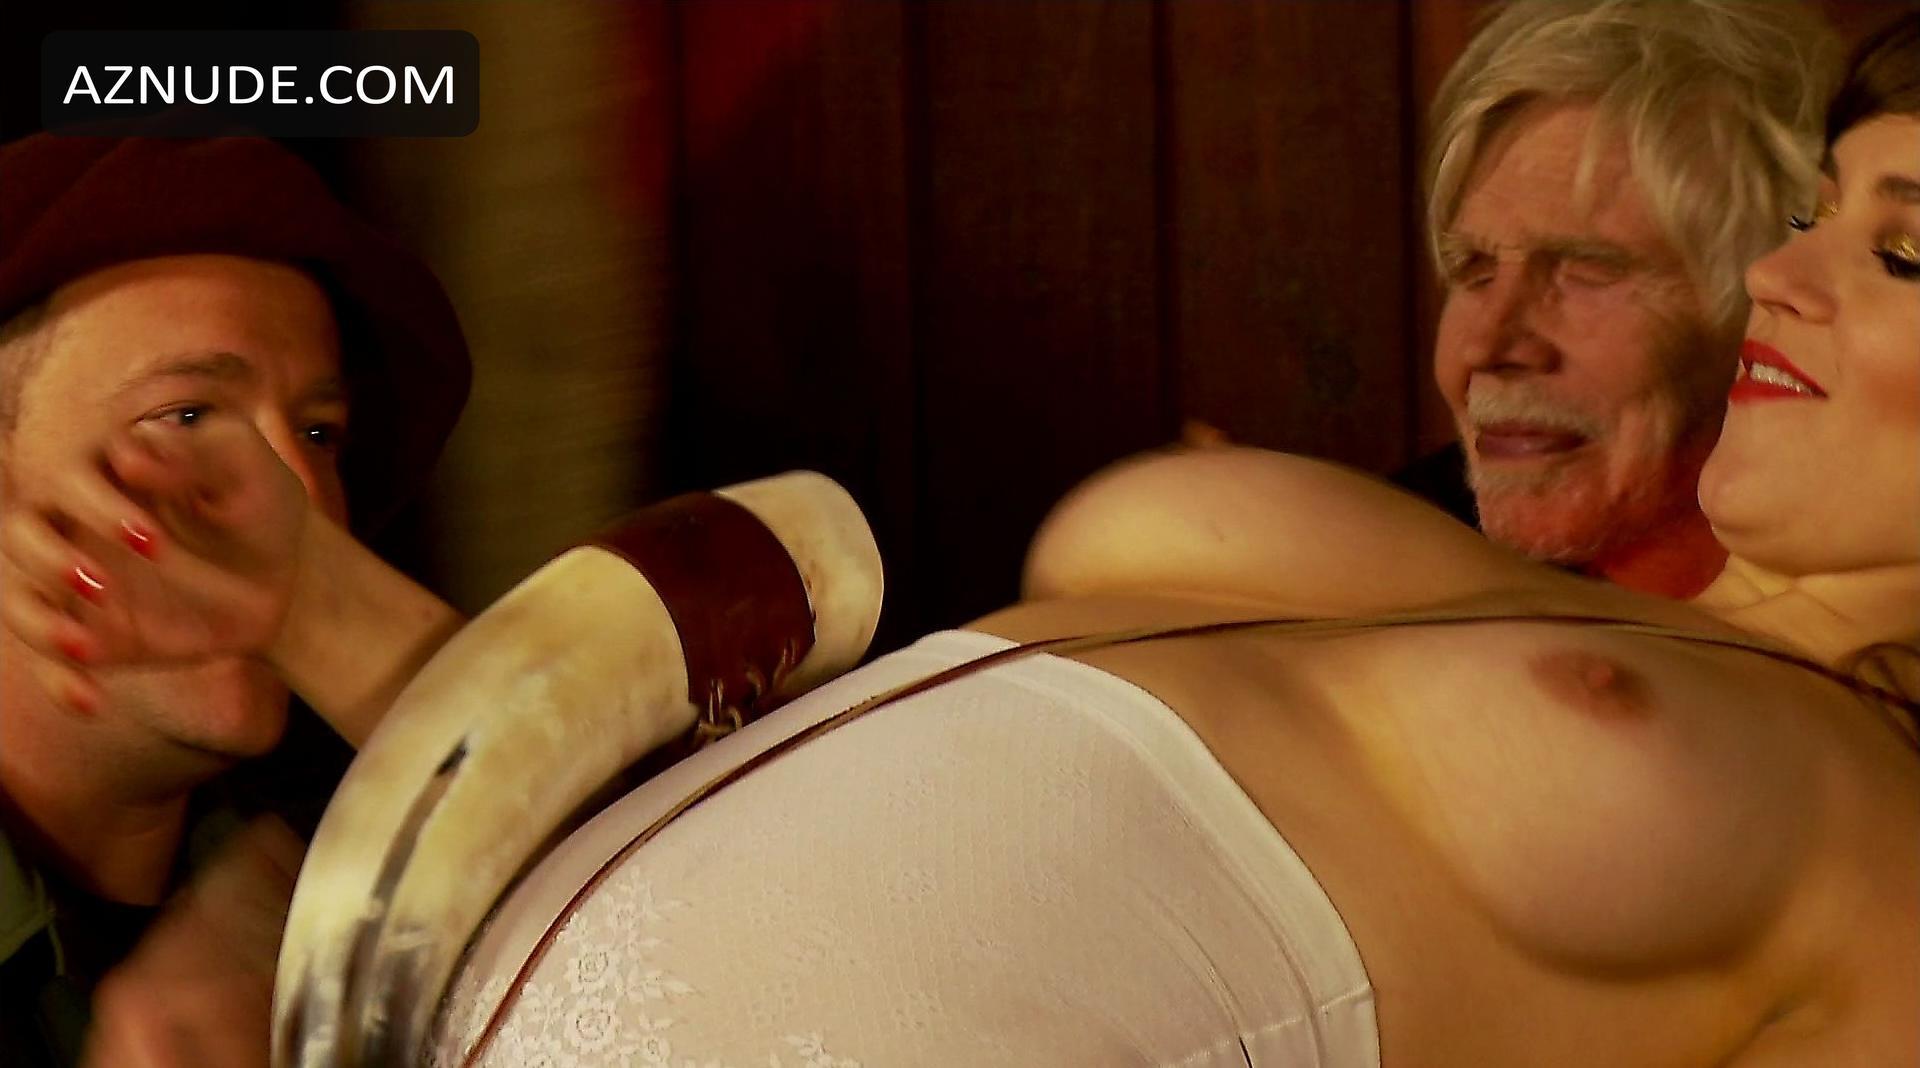 Dixon mason jeannette trexler loria vlies nude - 1 part 5